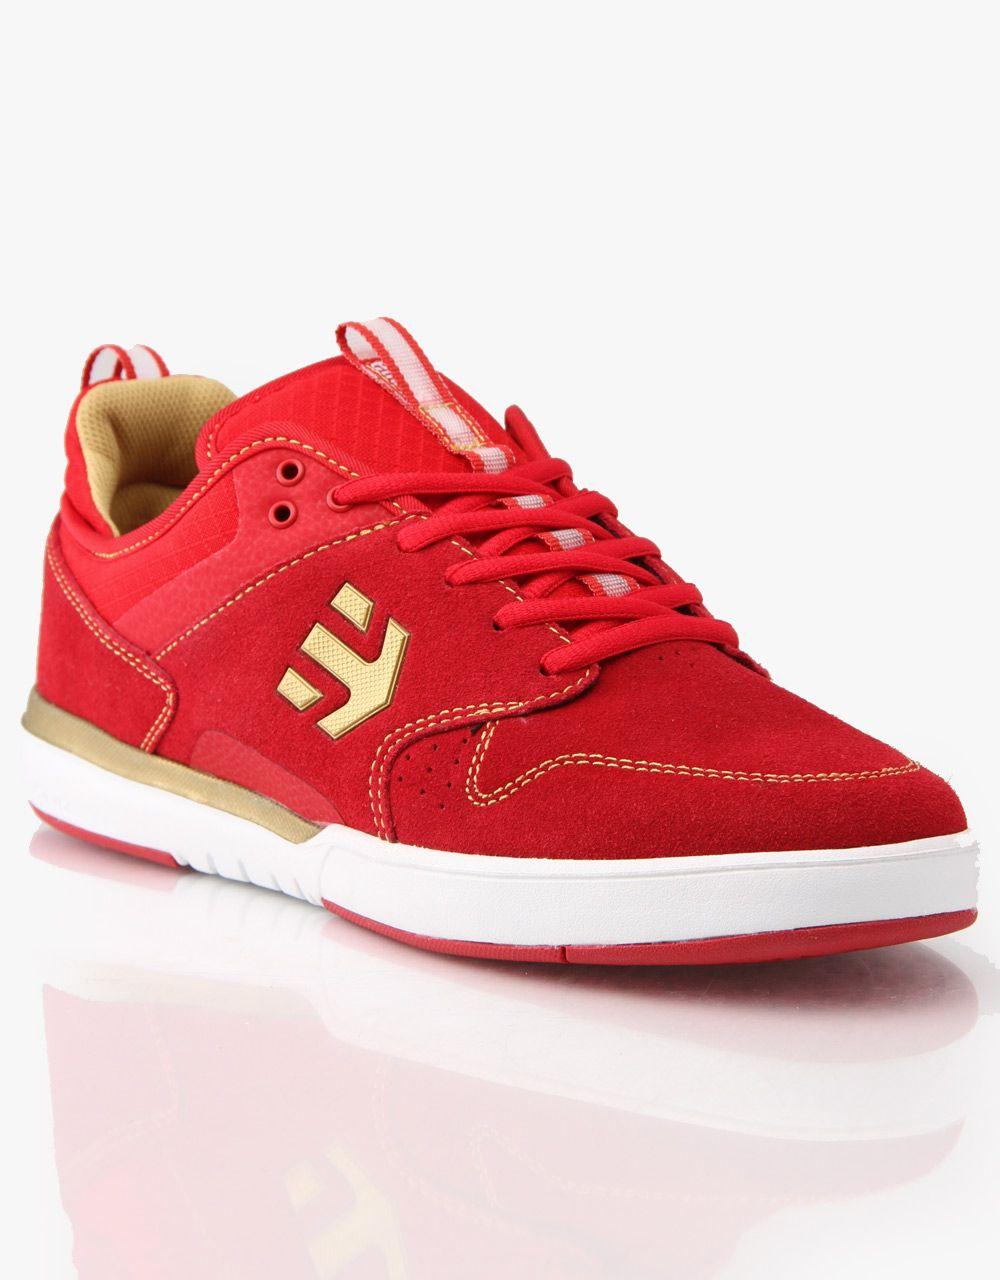 Etnies Aventa Skate Shoes RedGold   Skate shoes, Shoes